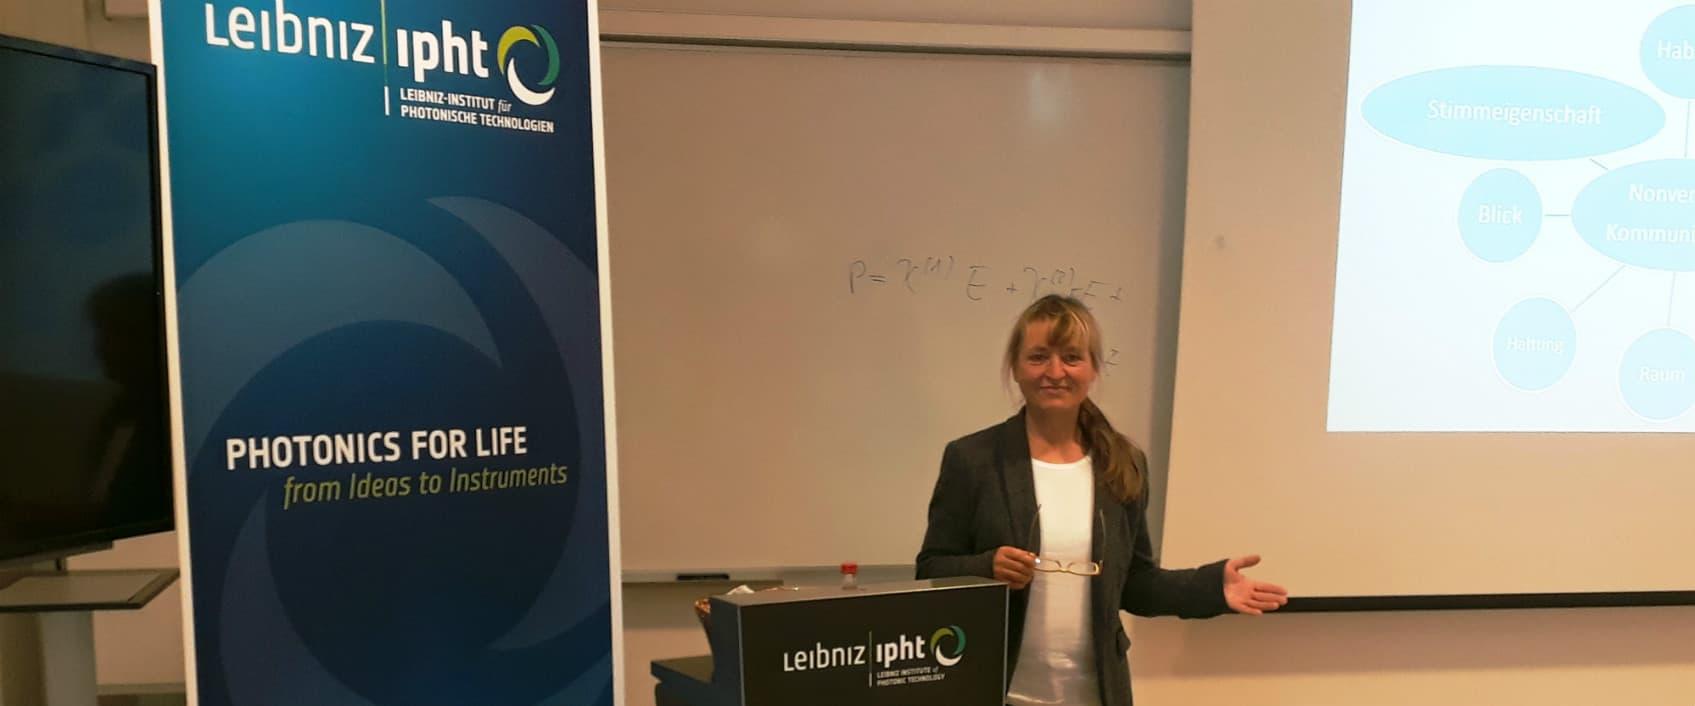 Kommunikationstrainerin Cornelia Plänitz aus Leipzig